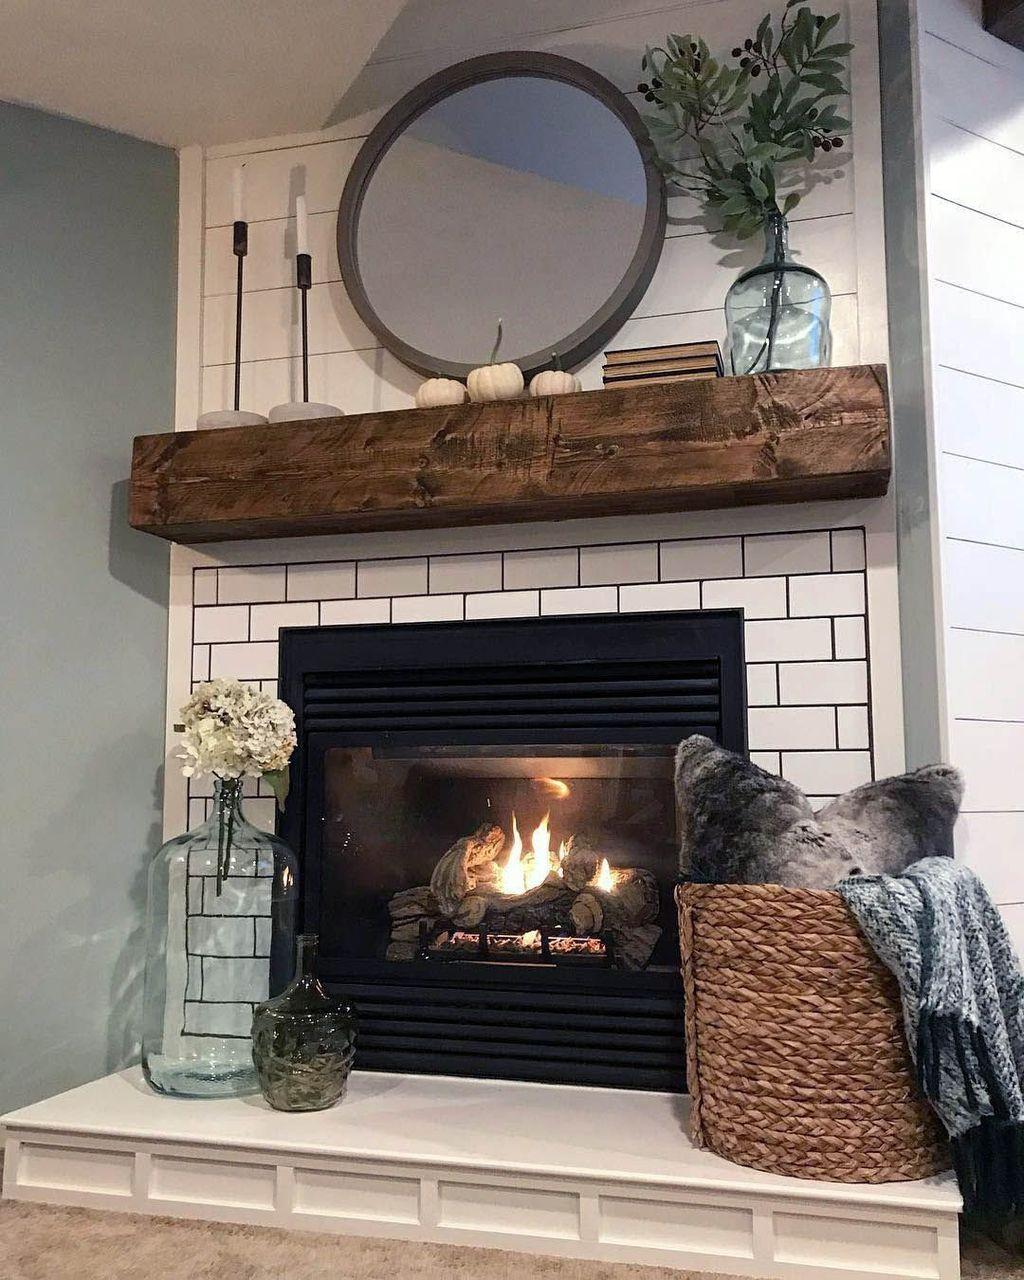 fireplace mantel designs on 32 popular modern farmhouse fireplace ideas trend 2020 farmhouse fireplace decor corner fireplace decor rustic farmhouse fireplace farmhouse fireplace decor